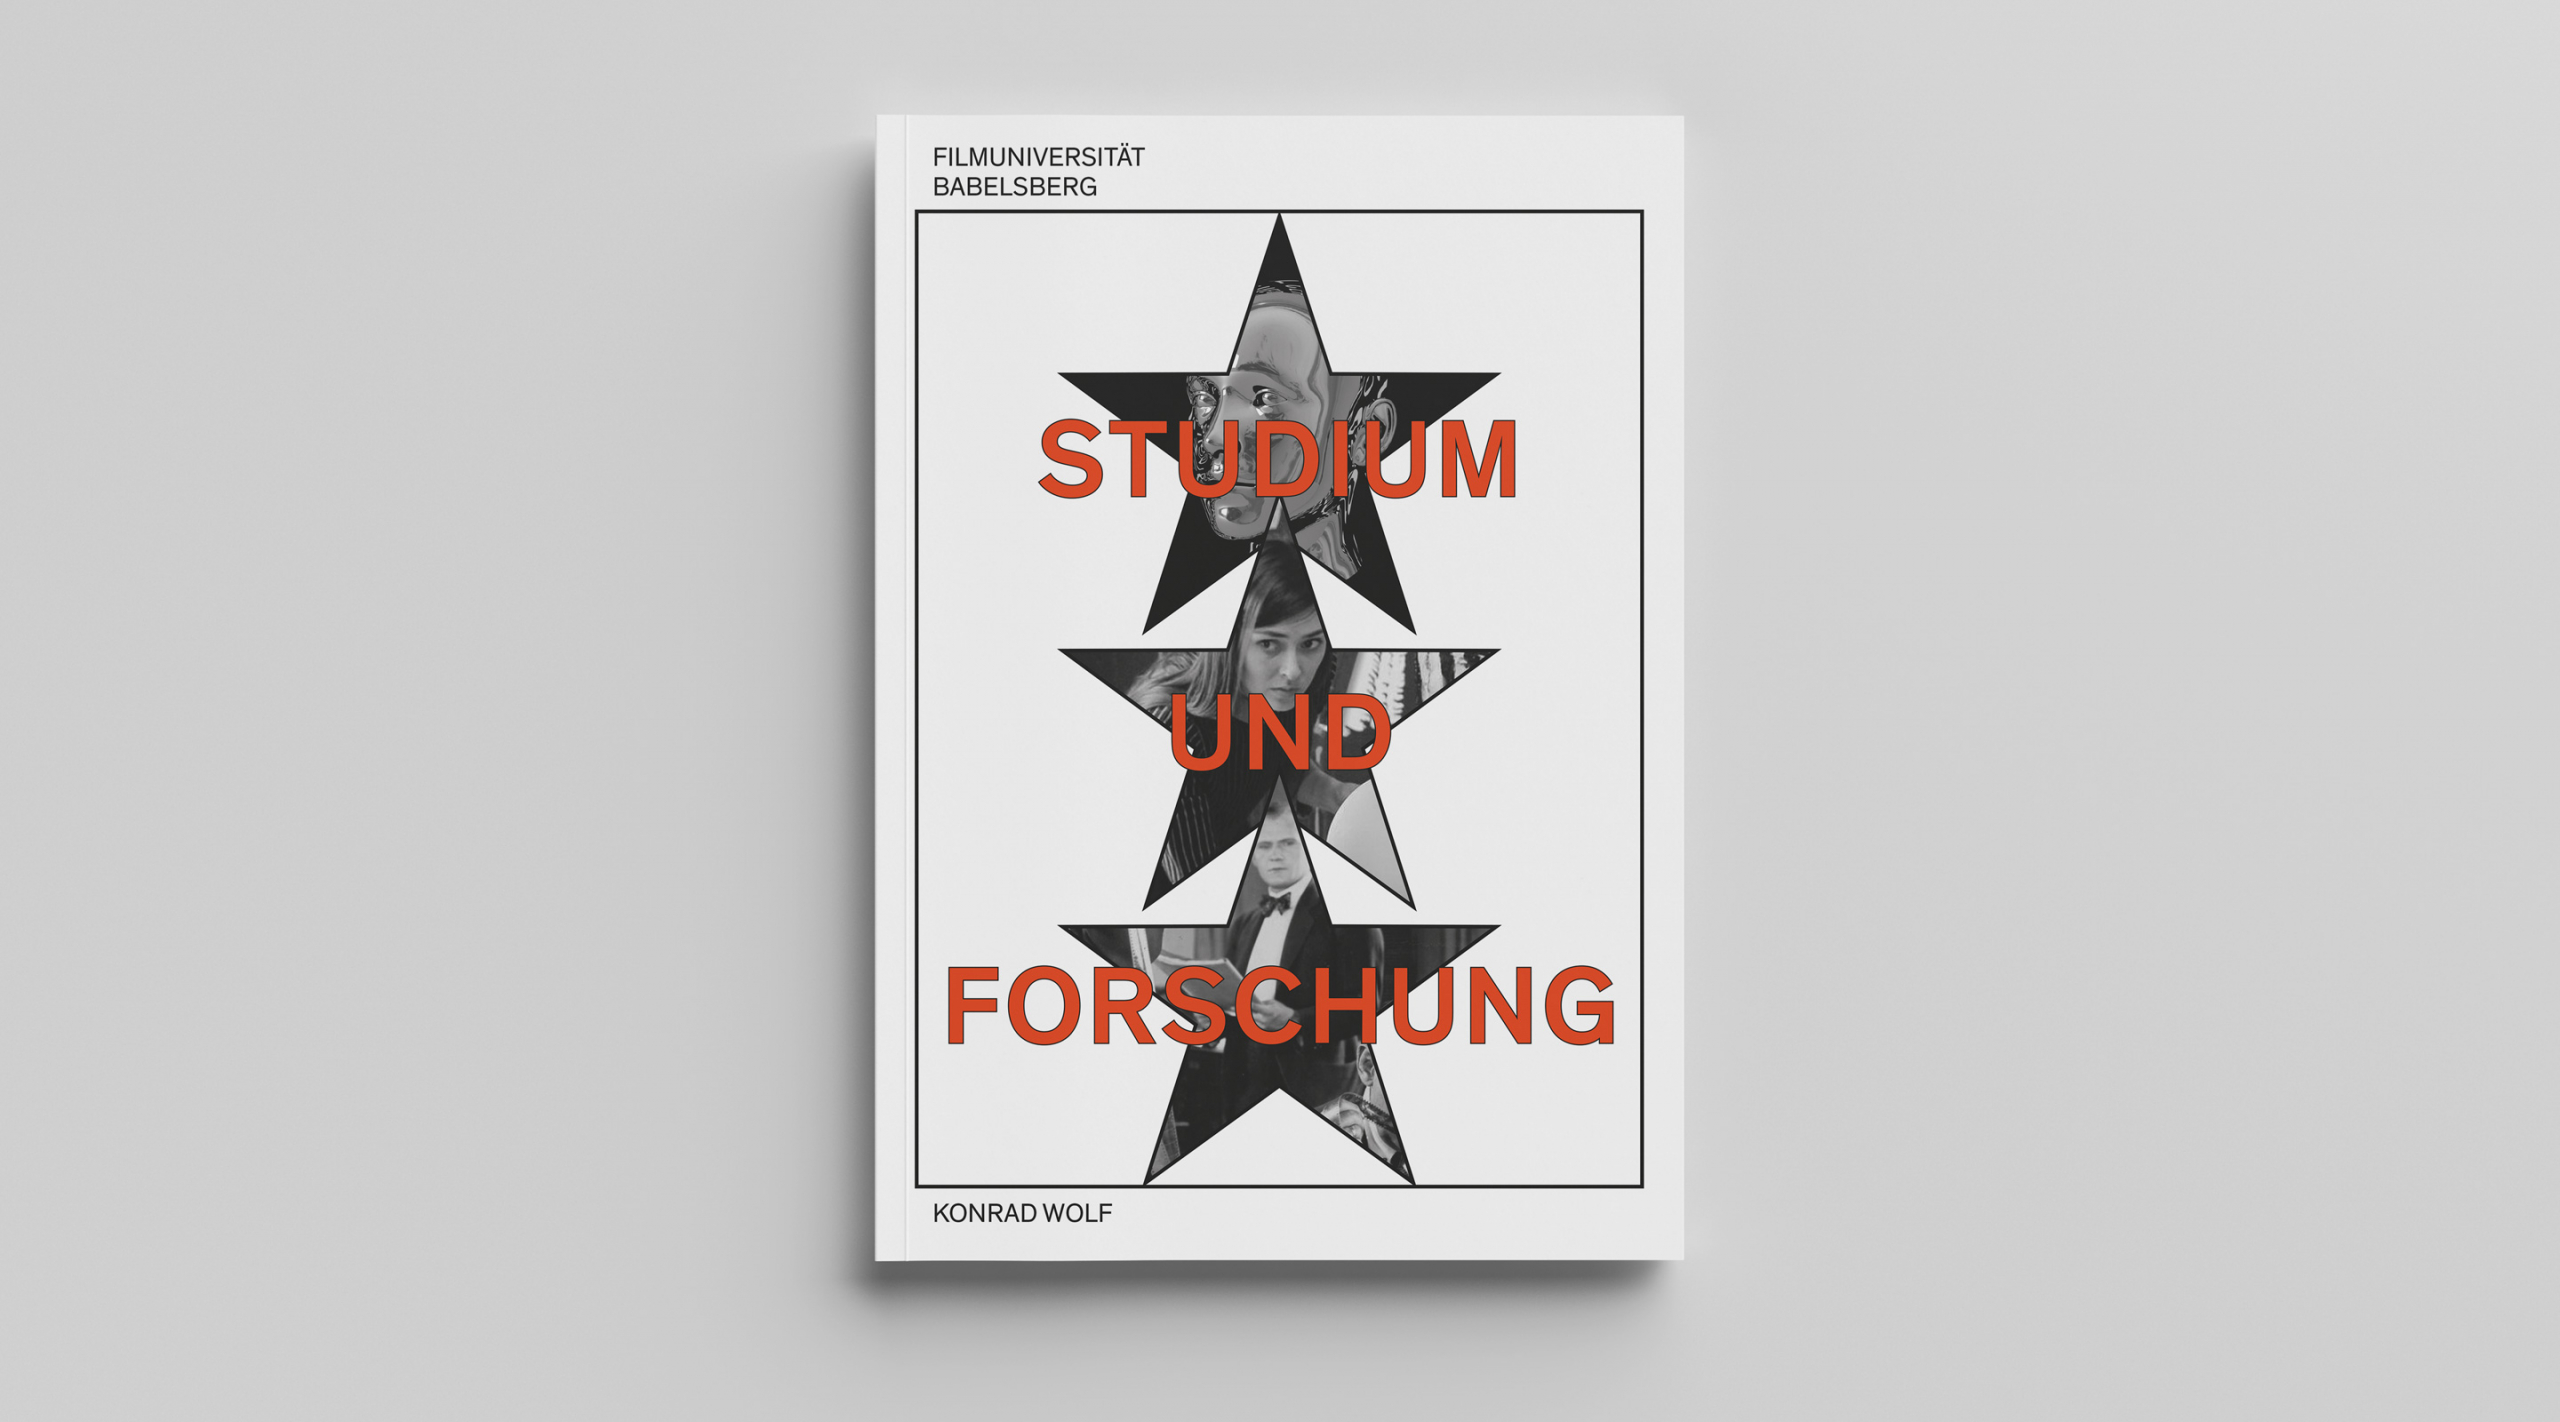 Filmuniversität Branding Proposal Cover – Uthmöller und Partner